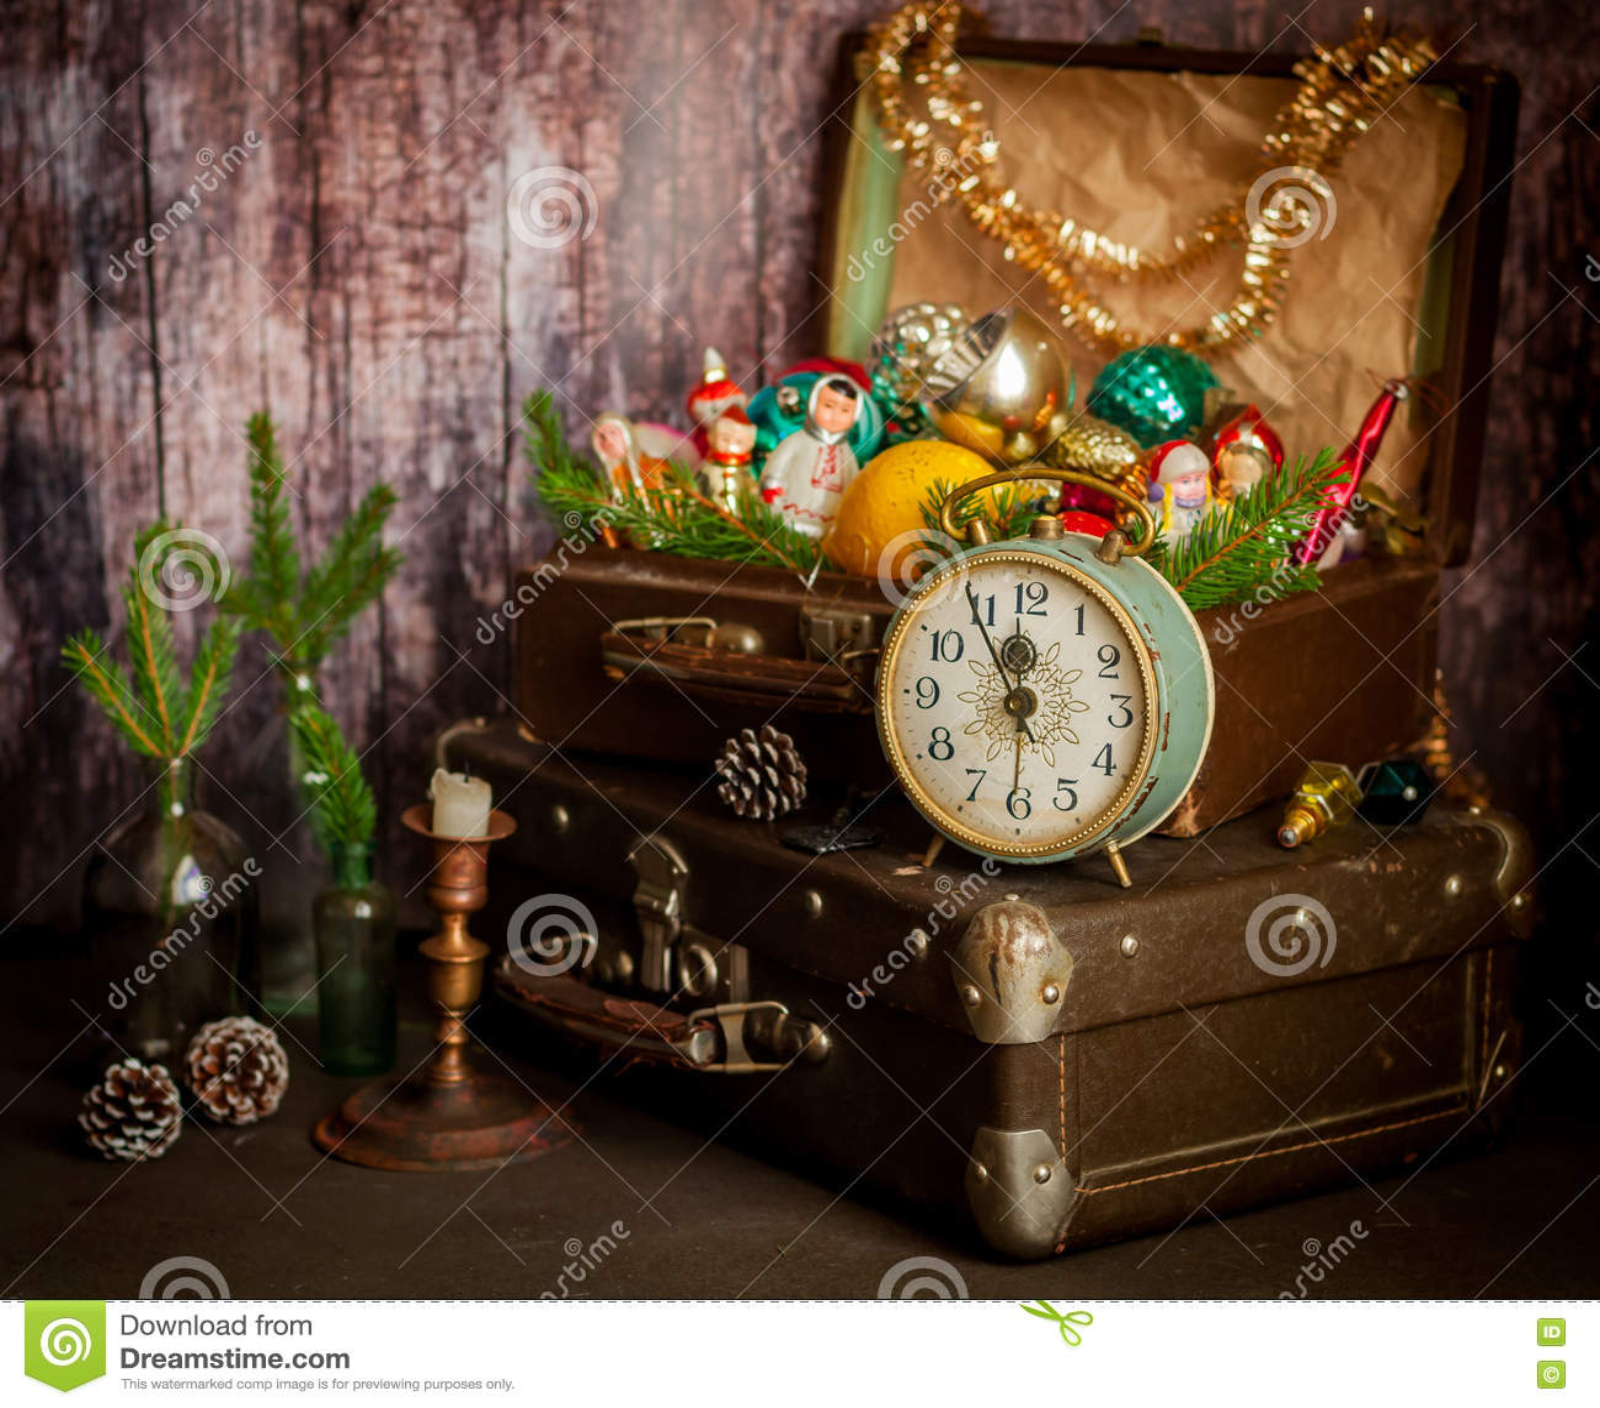 retro clock suitcases christmas tree decorations - Old Fashioned Christmas Tree Decorations